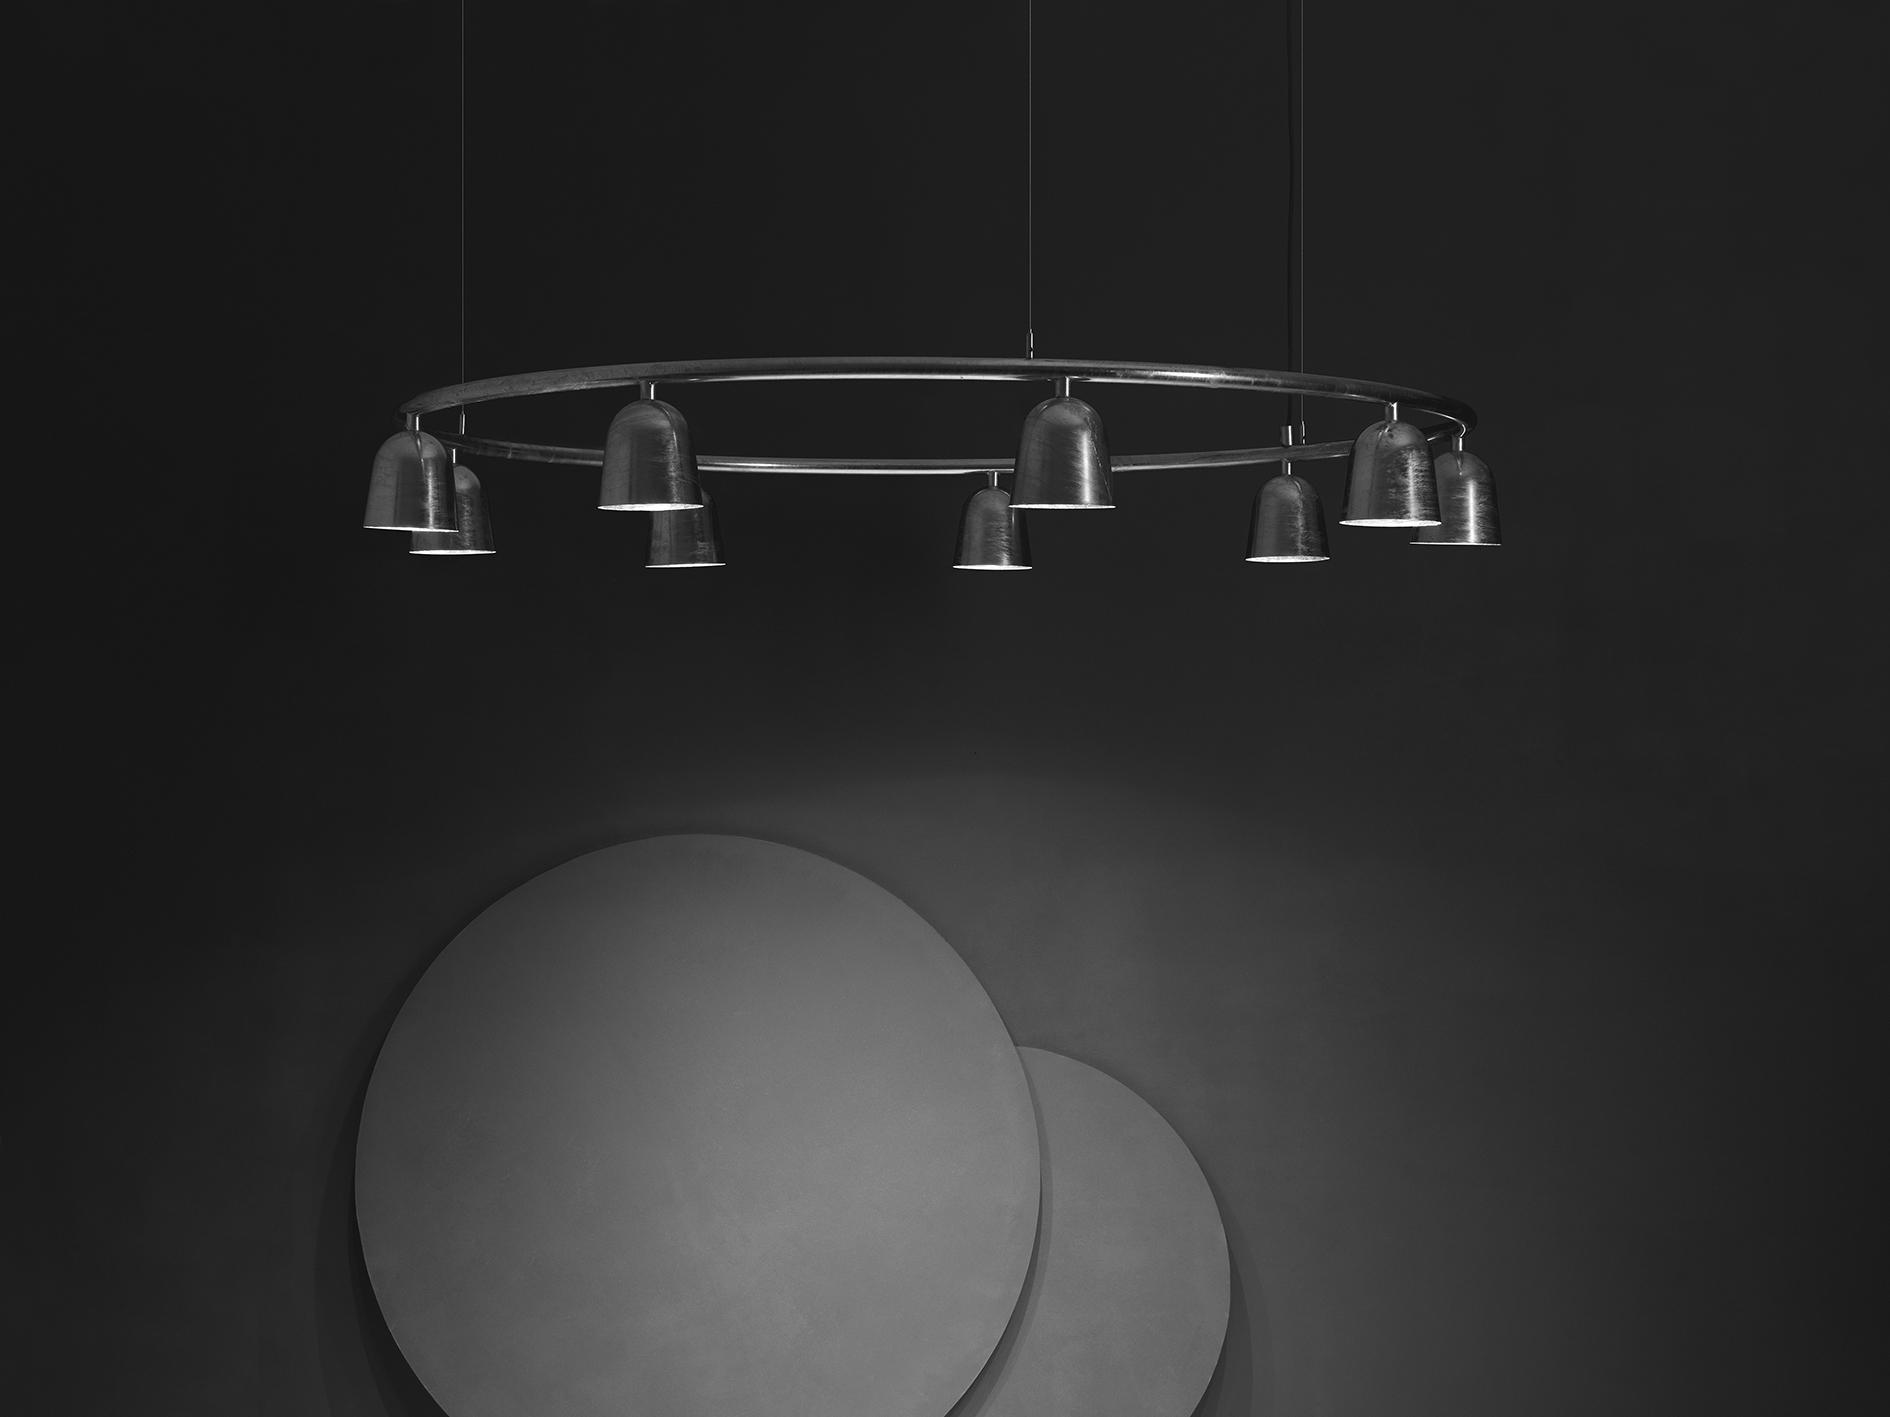 CONVEX-circle-galv-D1400.JPG